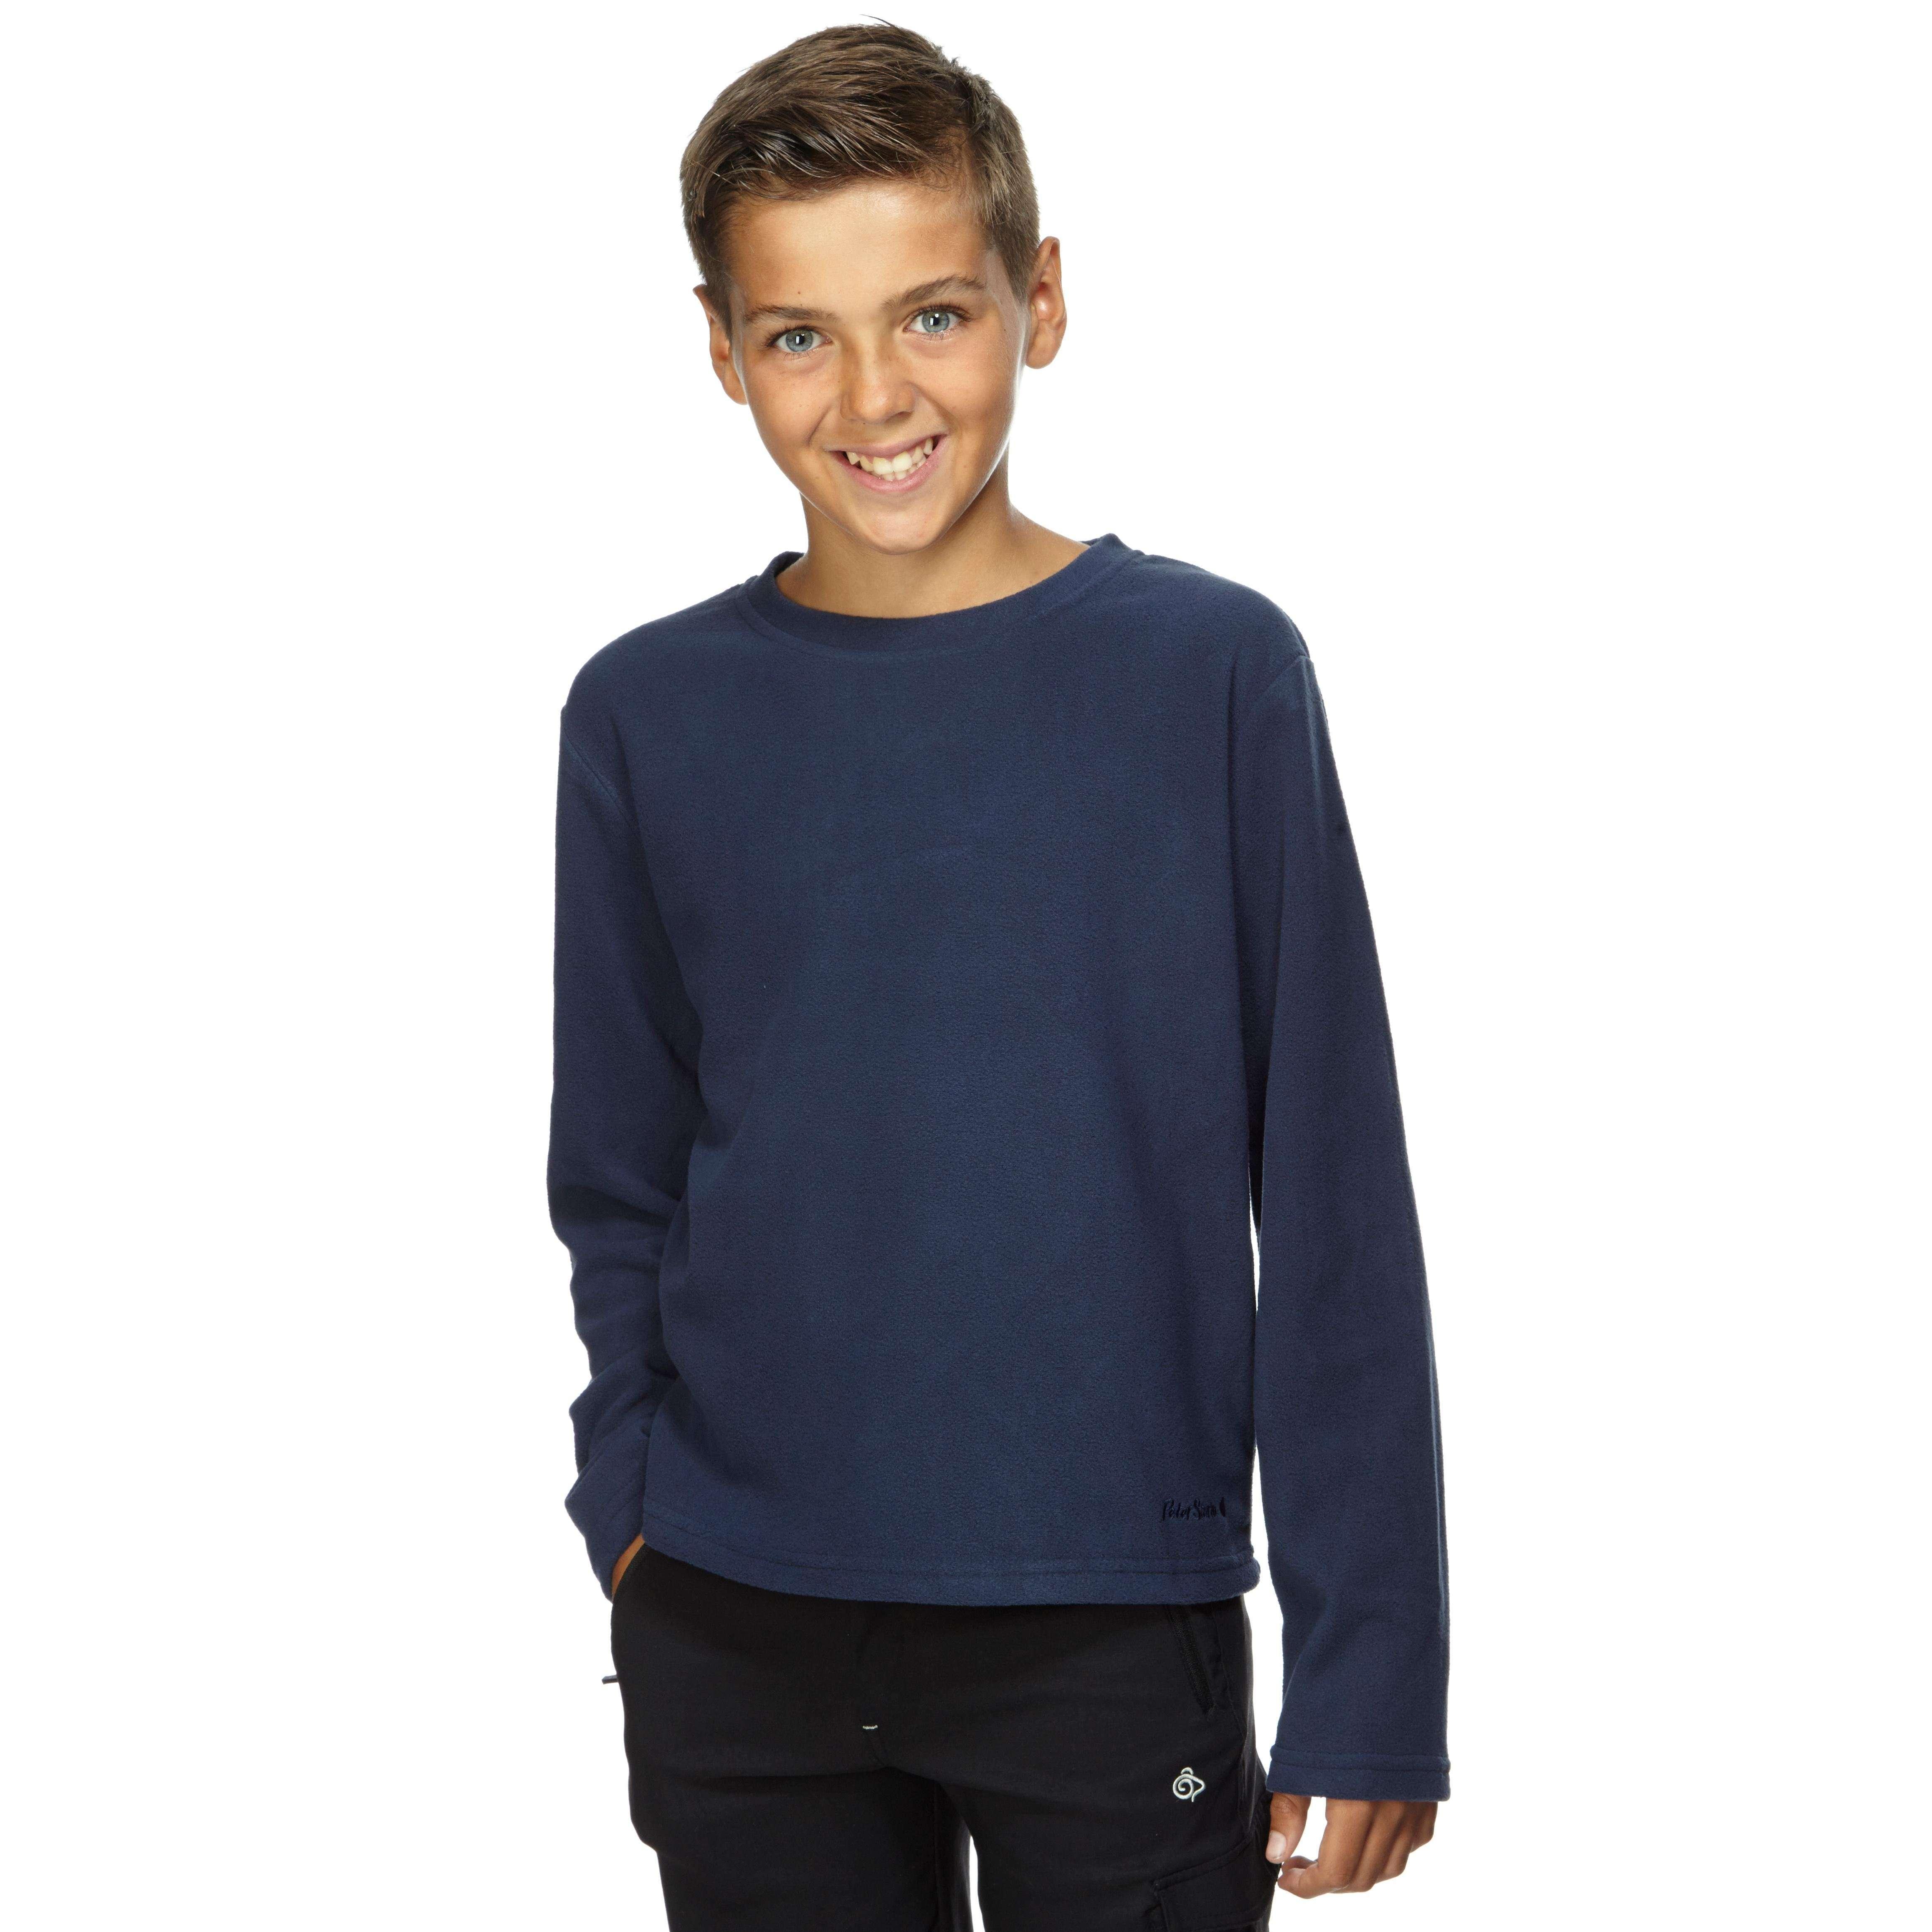 PETER STORM Kids' Unisex Coniston Crew Neck Fleece